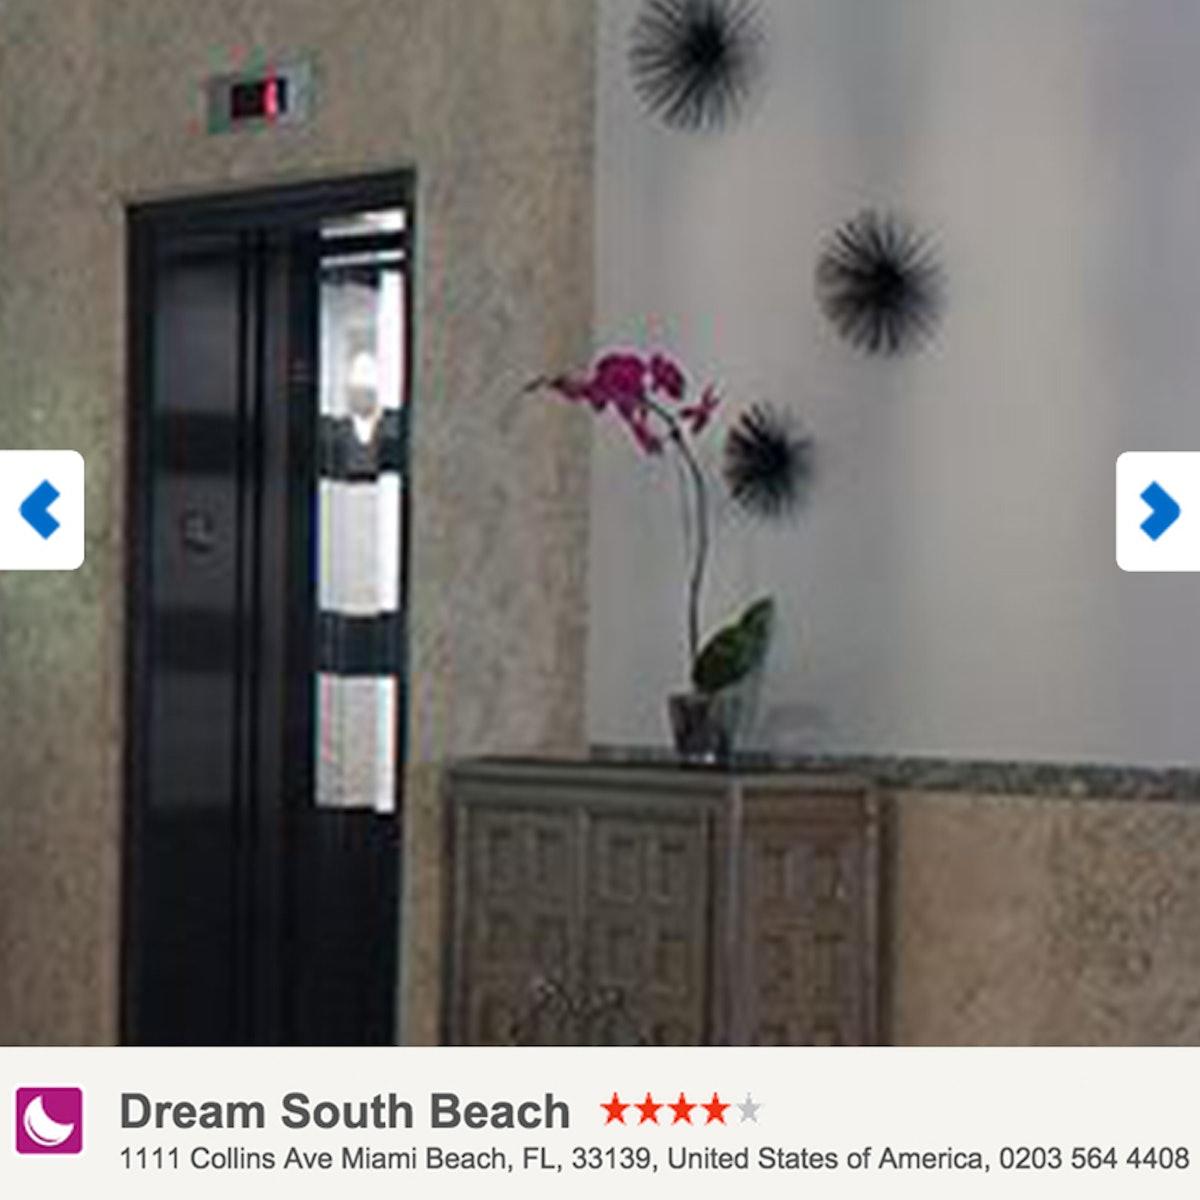 Amalia Ulman captures the Hotels of Miami